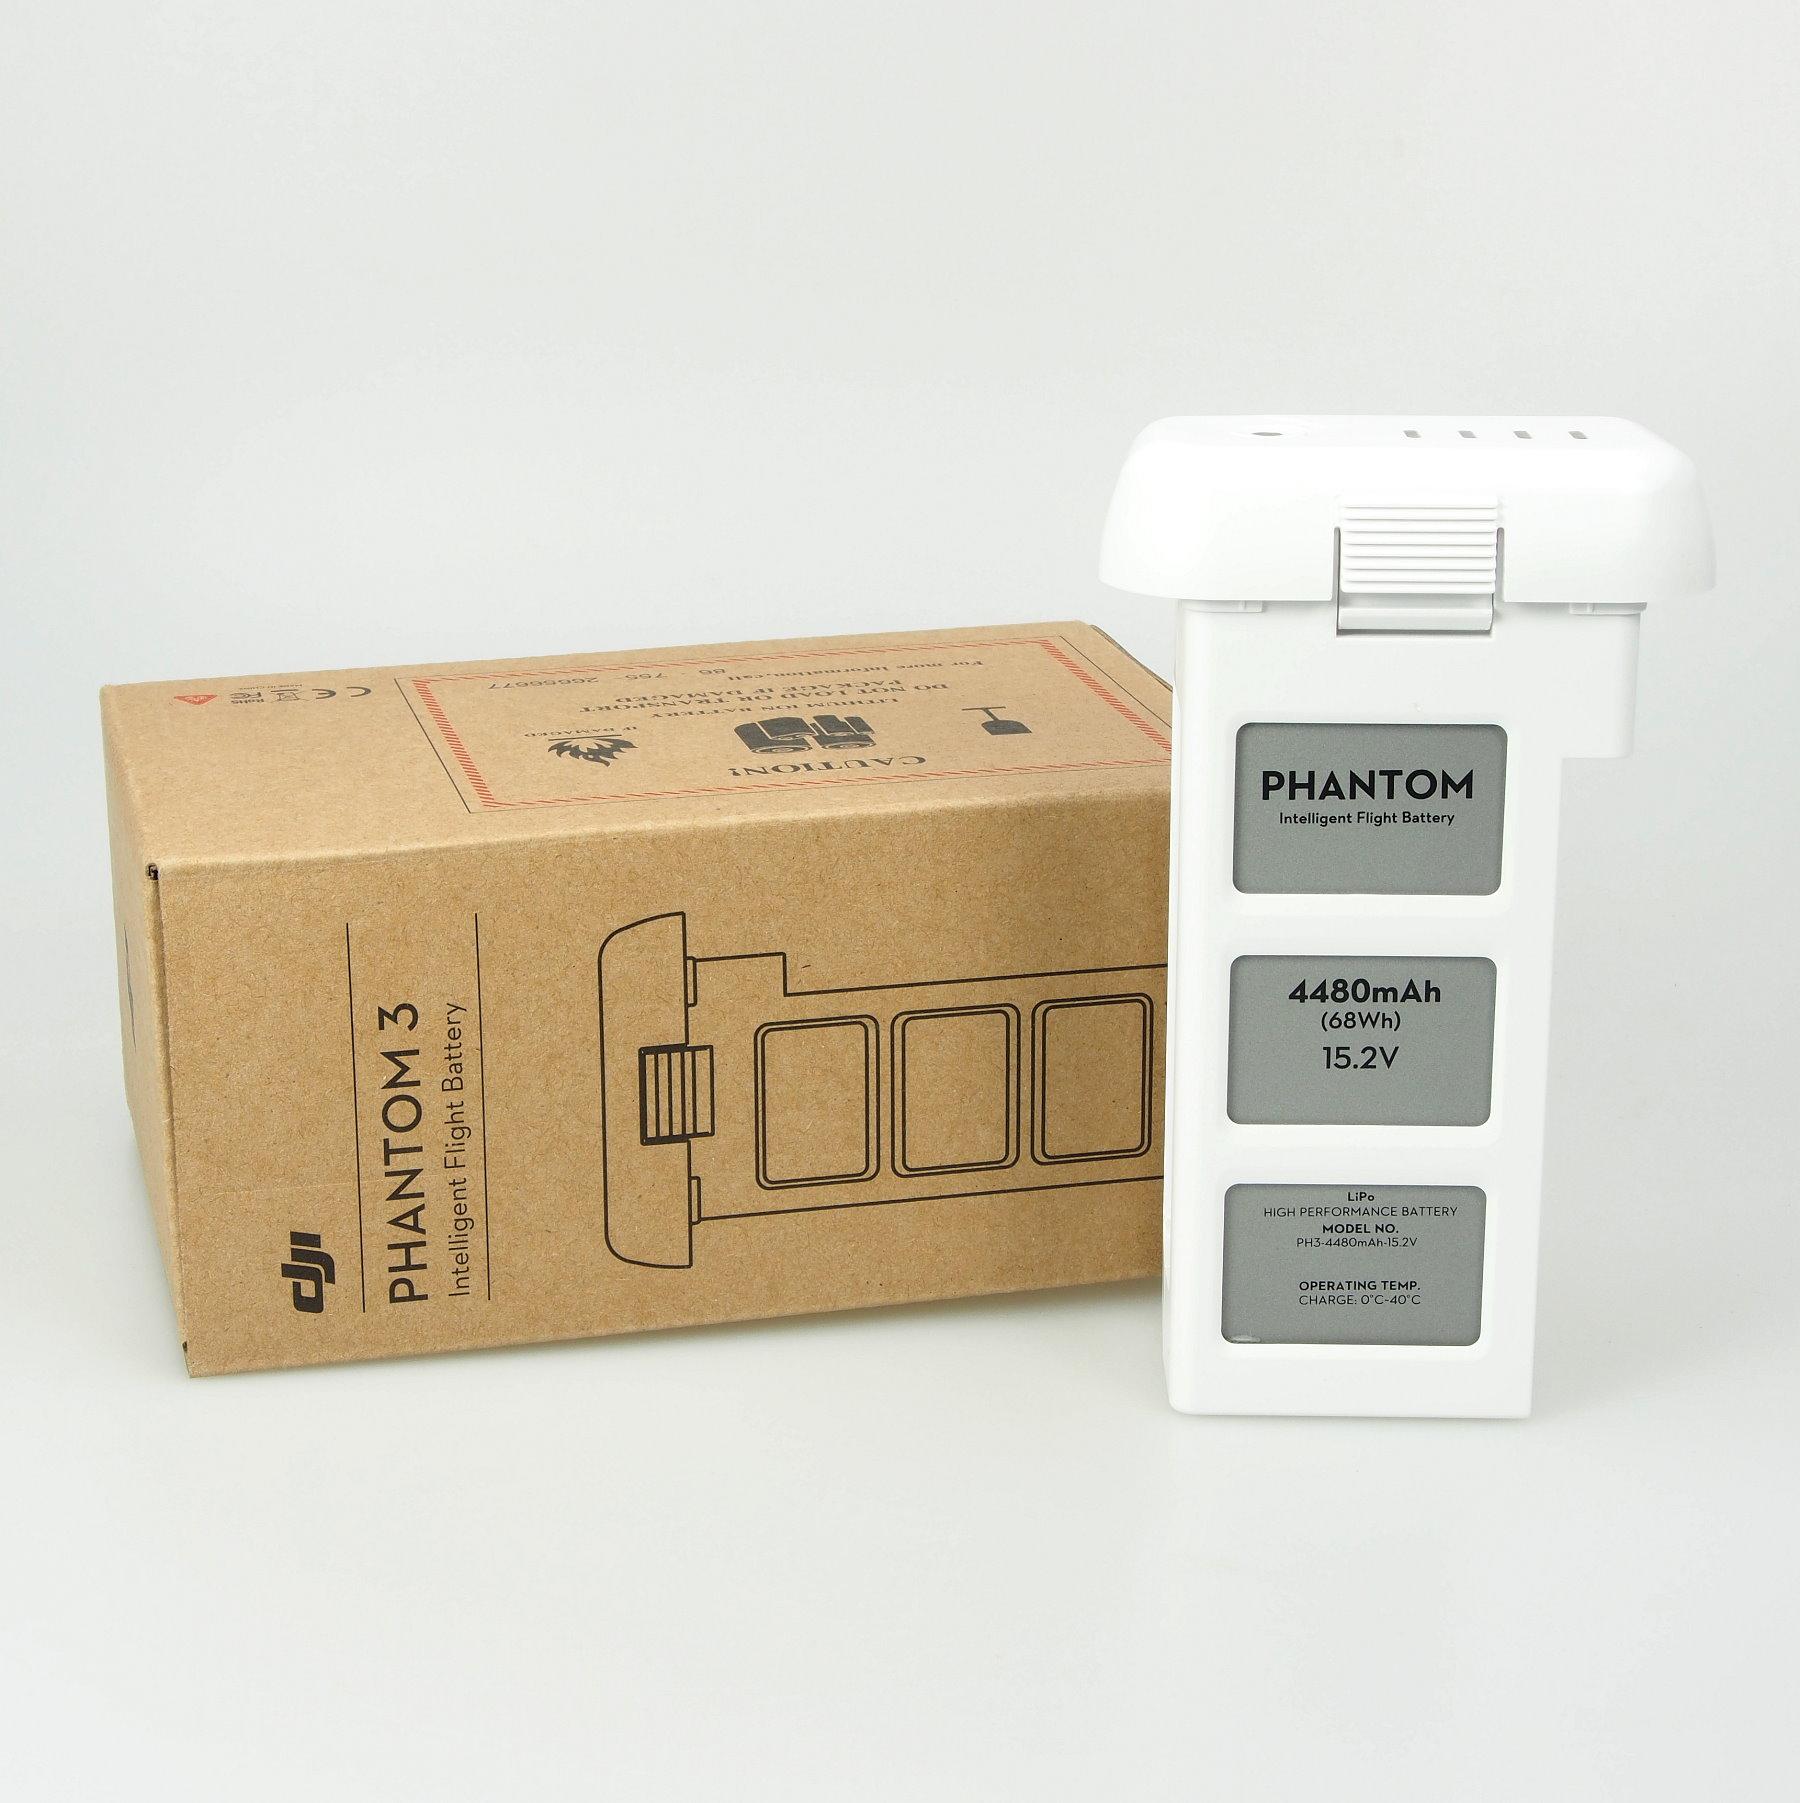 Jual Dji Phantom 3 Intelligent Flight Battery Batrei 4 Original Batrai I Tech Skw Tokopedia